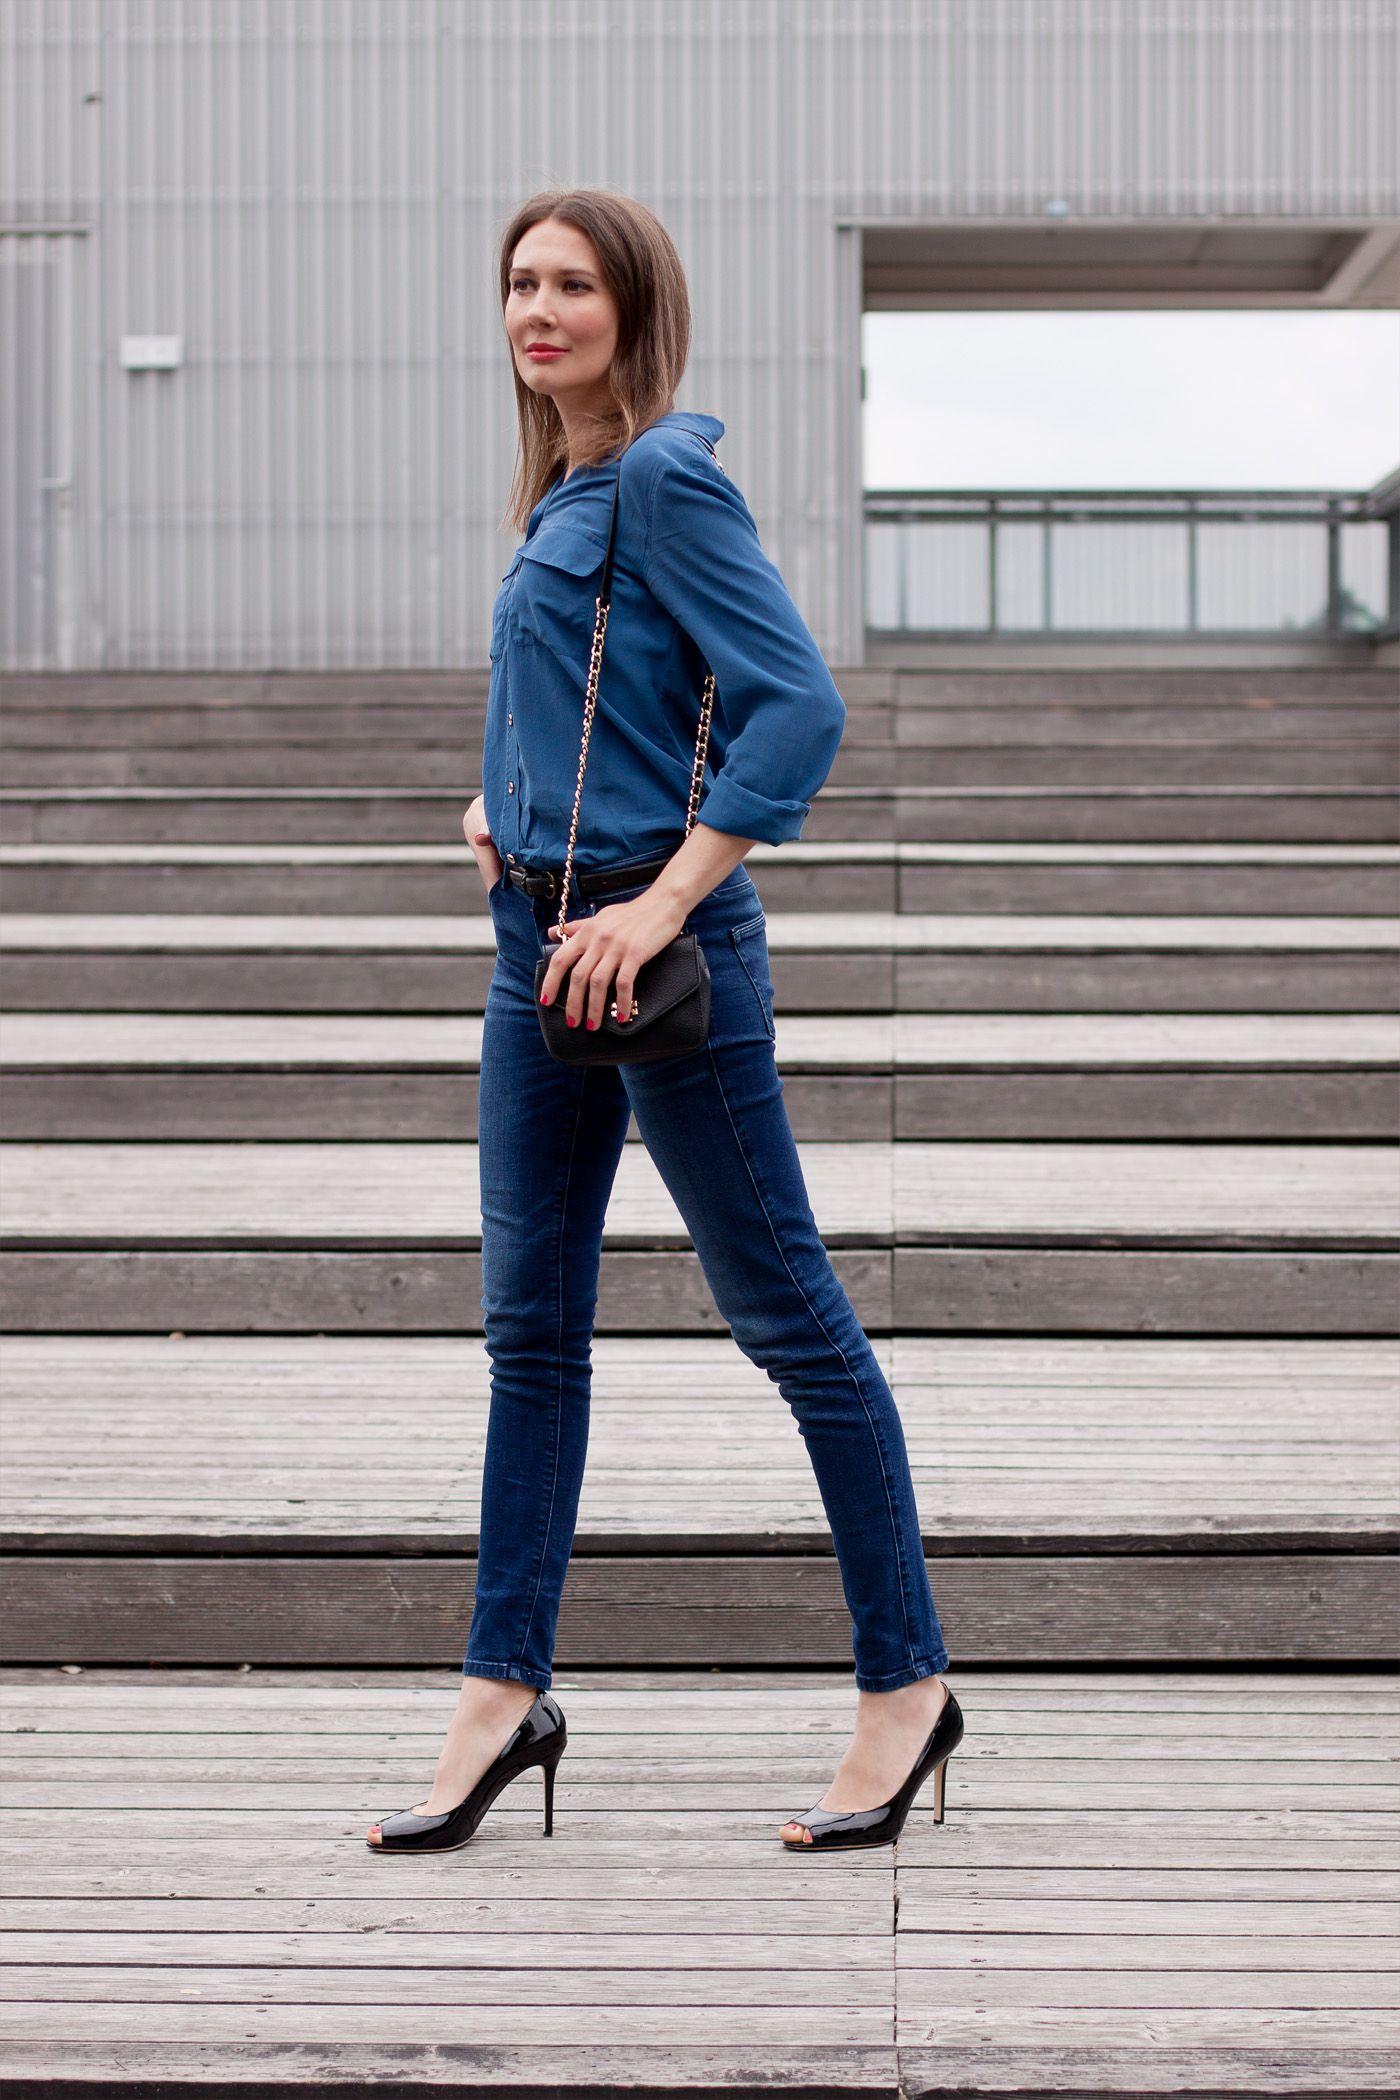 Blue Silk and Dark Denim | full article on my blog: http://www.moodforstyle.de/outfit-blue-silk-and-dark-denim/ | high heels | jeans | denim | silk